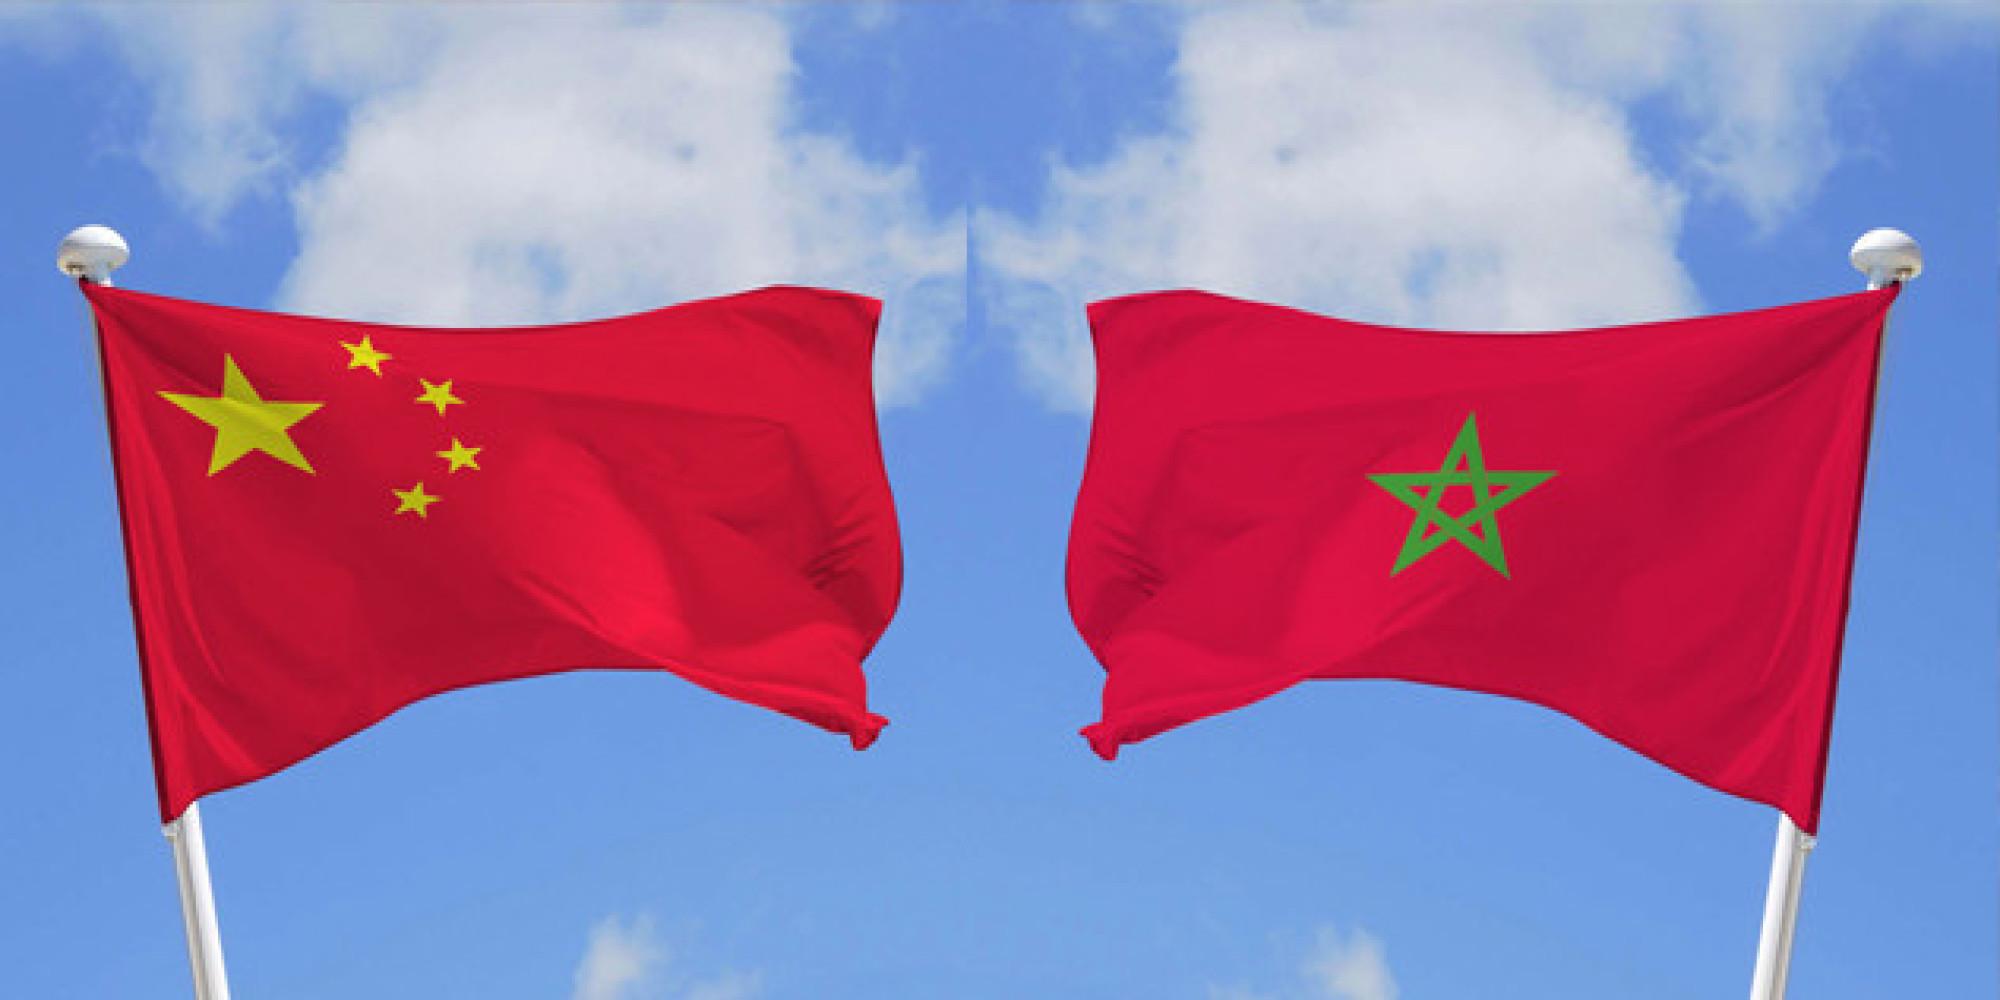 China Trade Week Morocco : Les entreprises chinoises en force au Maroc